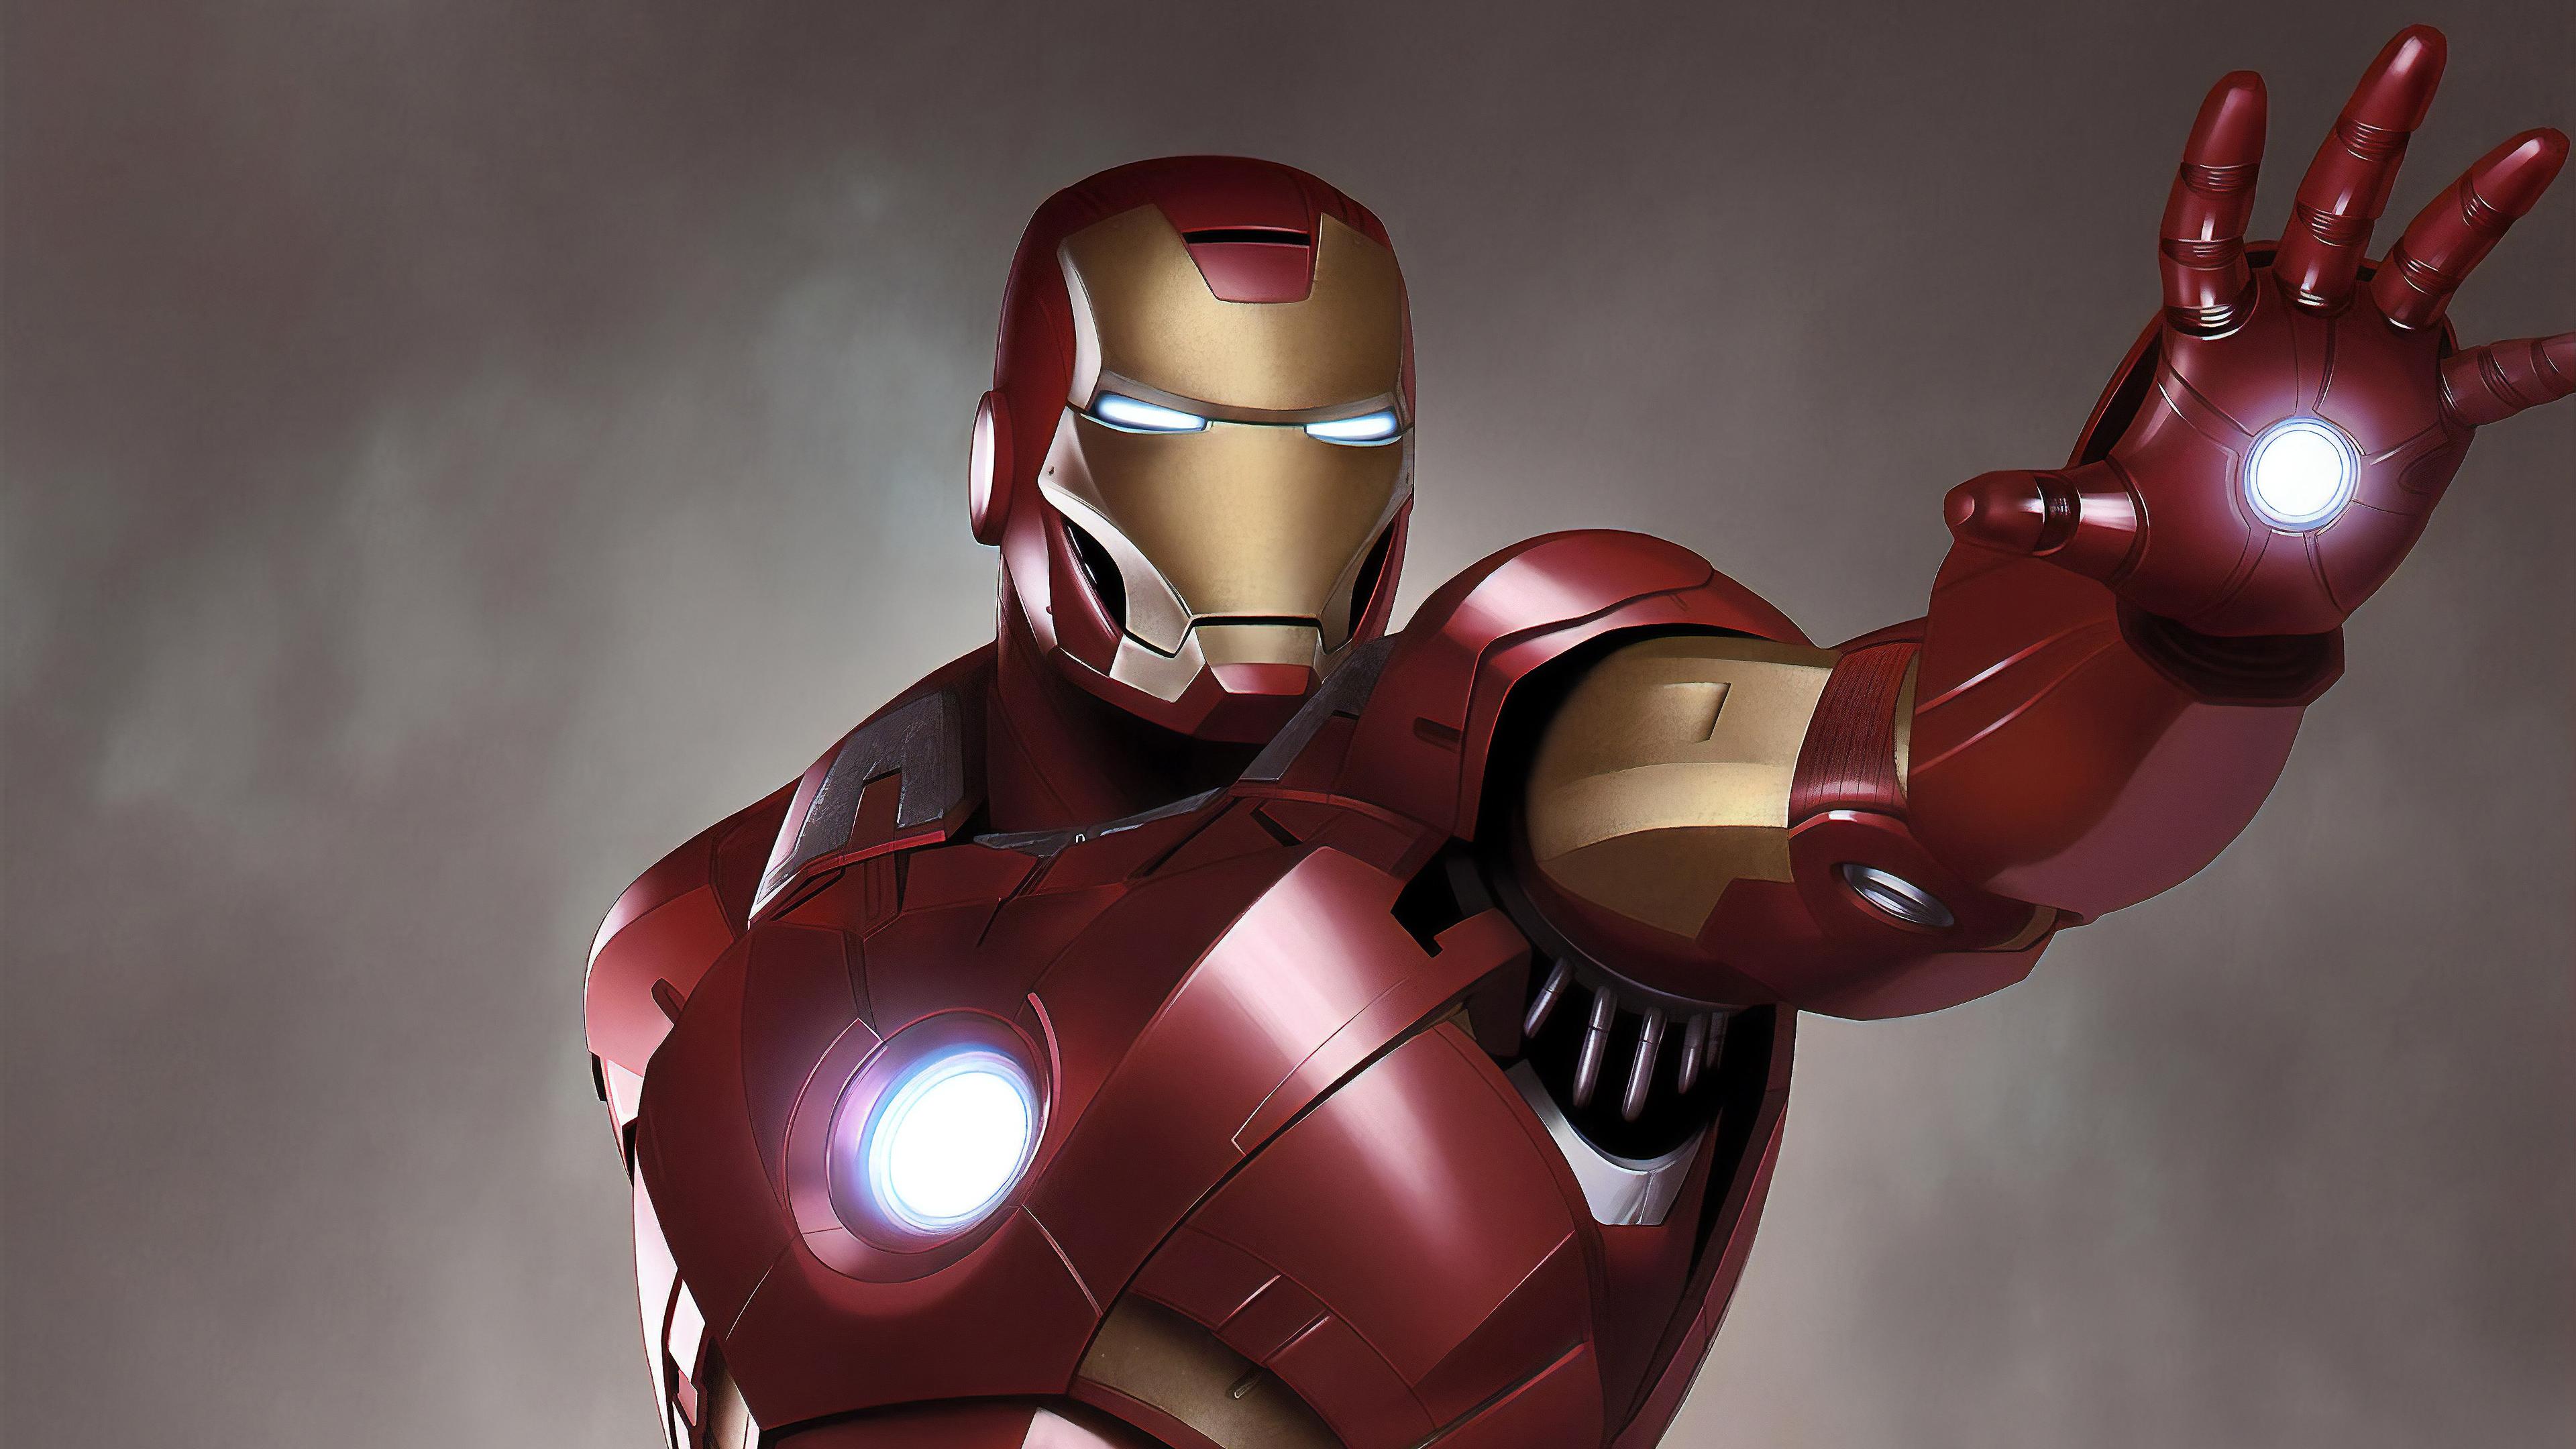 Wallpaper 4k Iron Man 4k New Artwork 4k-wallpapers, artist